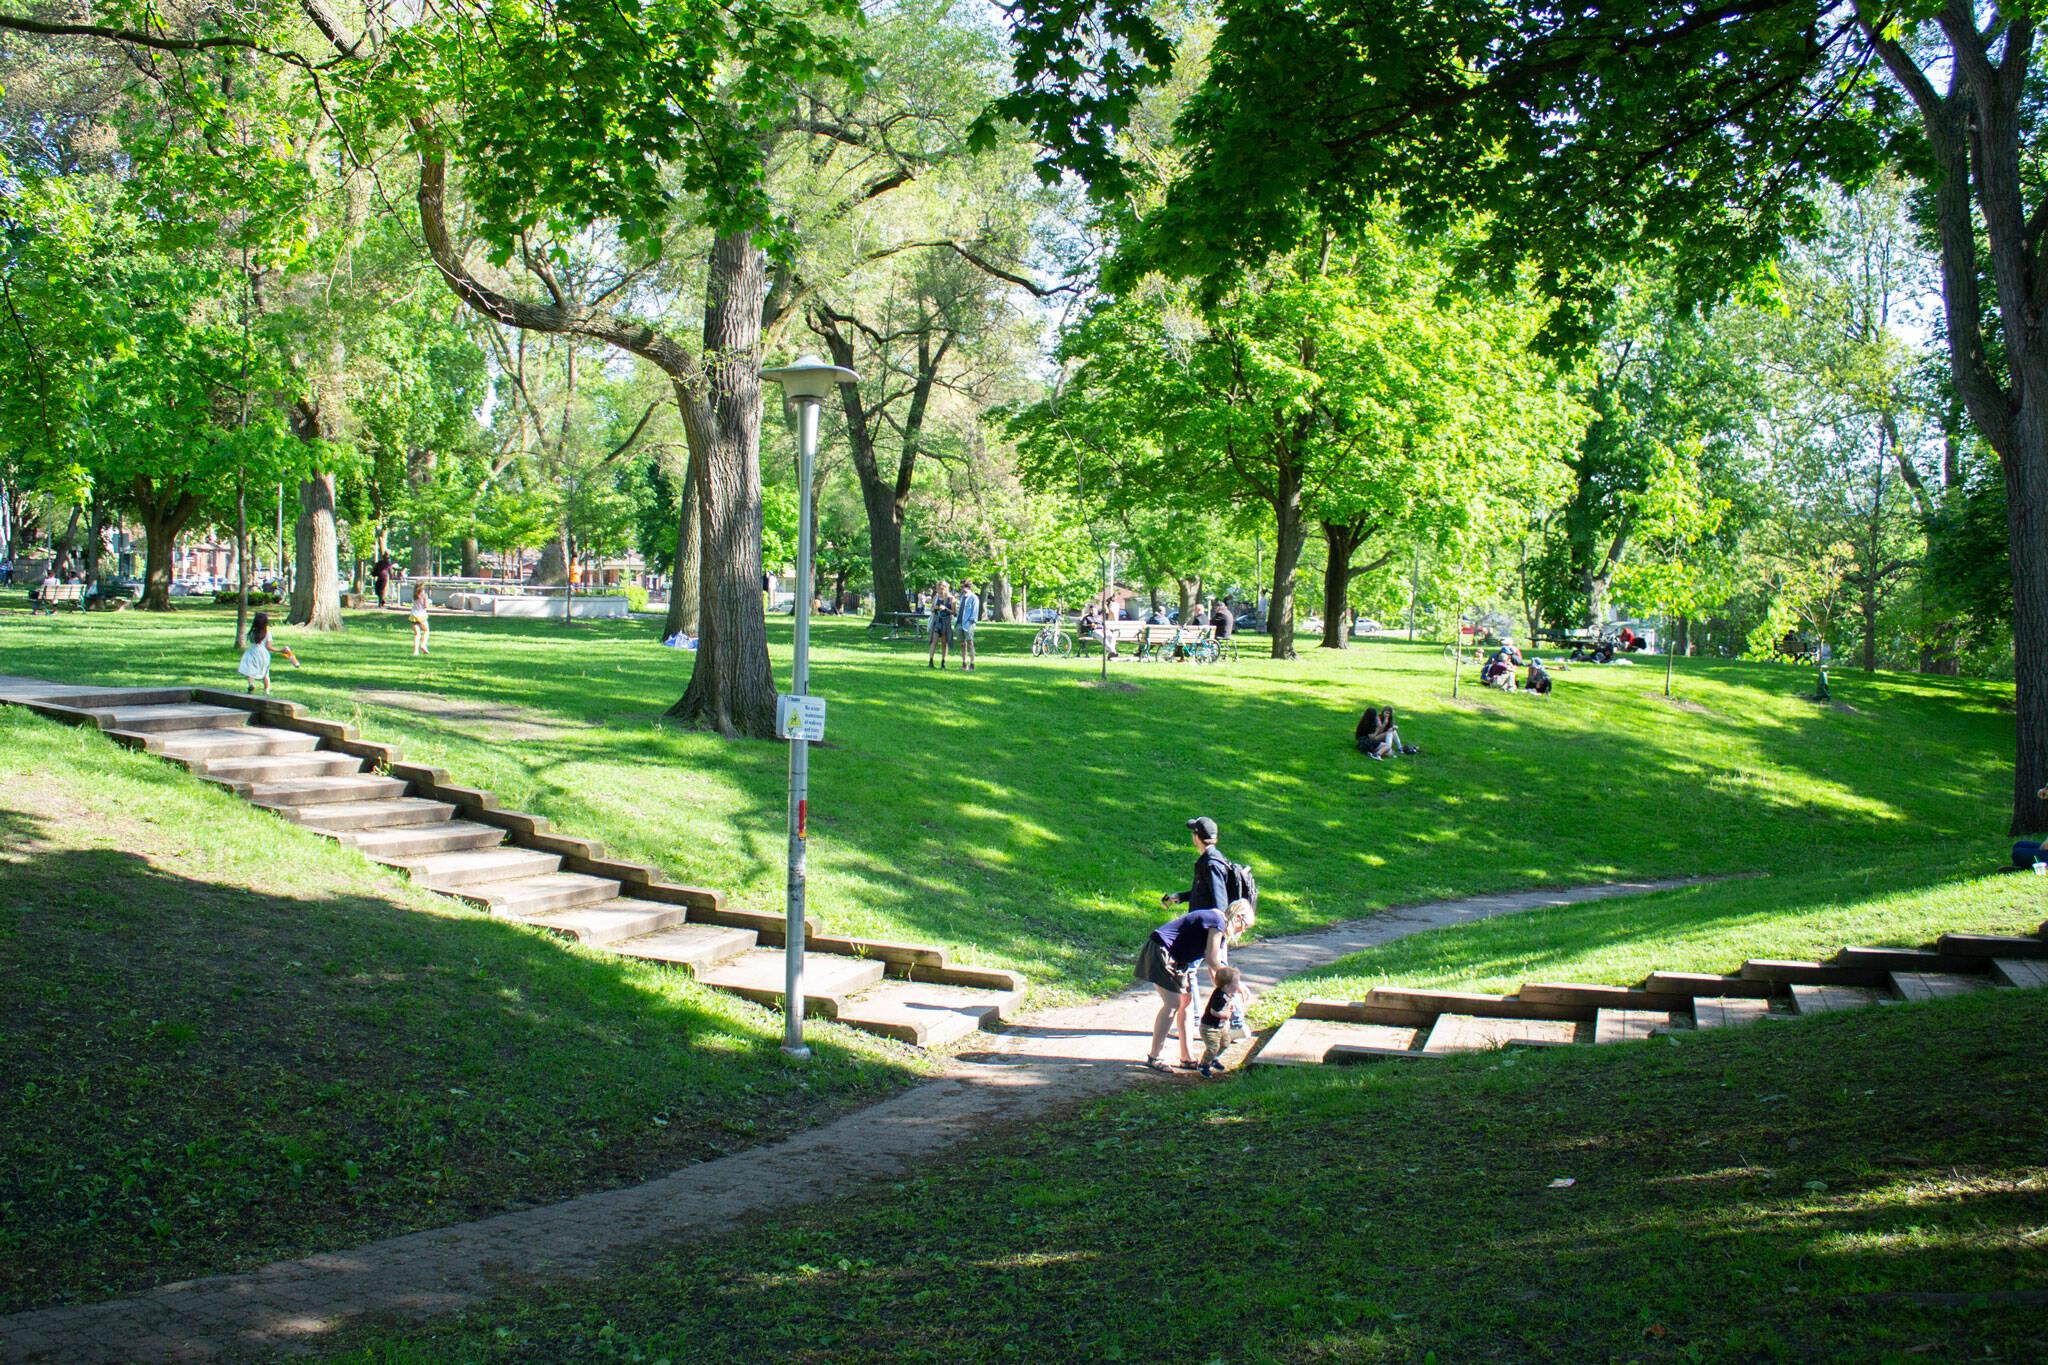 dufferin grove park